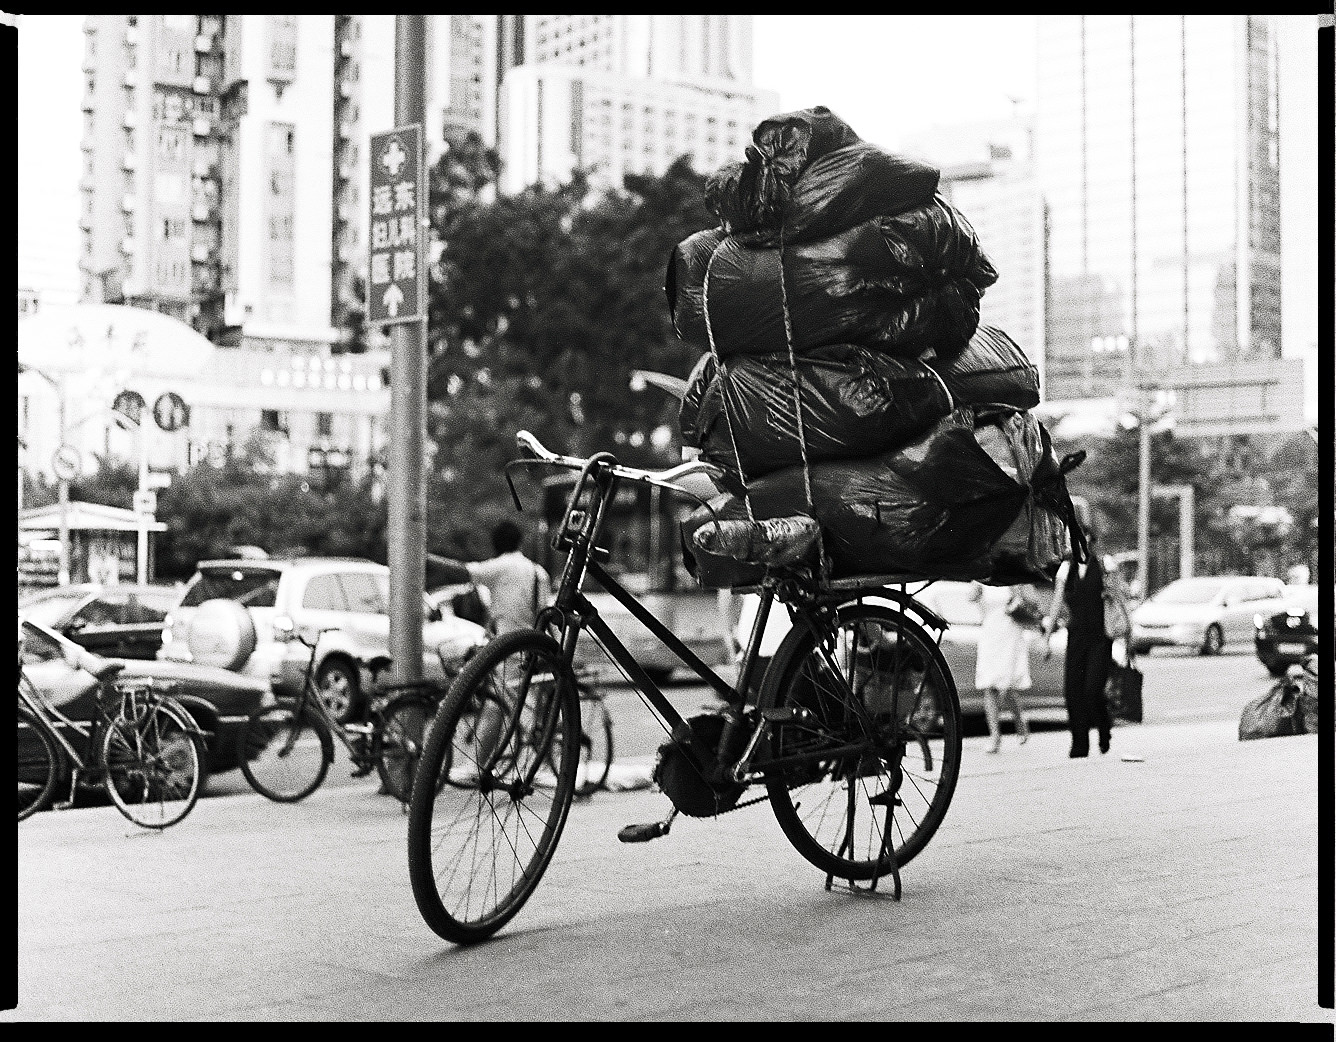 MediumFormatPatrikWallner_Shenzhen_LuggageLOWQ